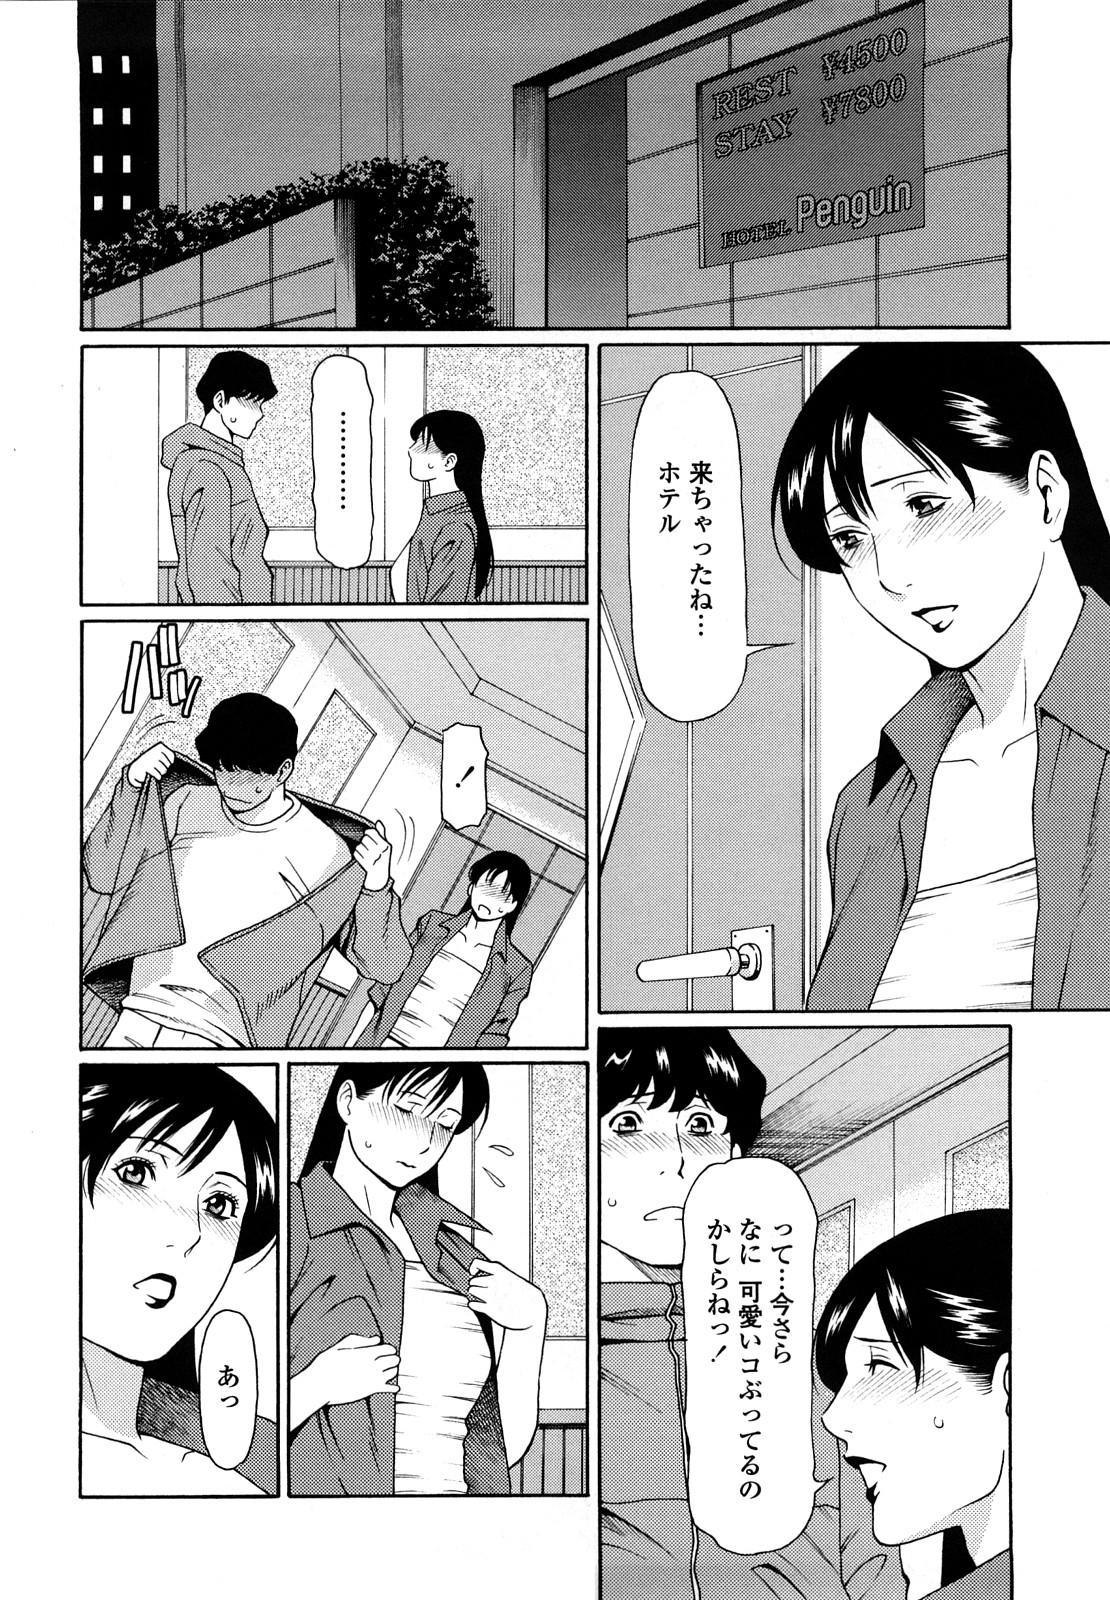 [Takasugi Kou] Kindan no Haha-Ana - Immorality Love-Hole [Decensored] 141